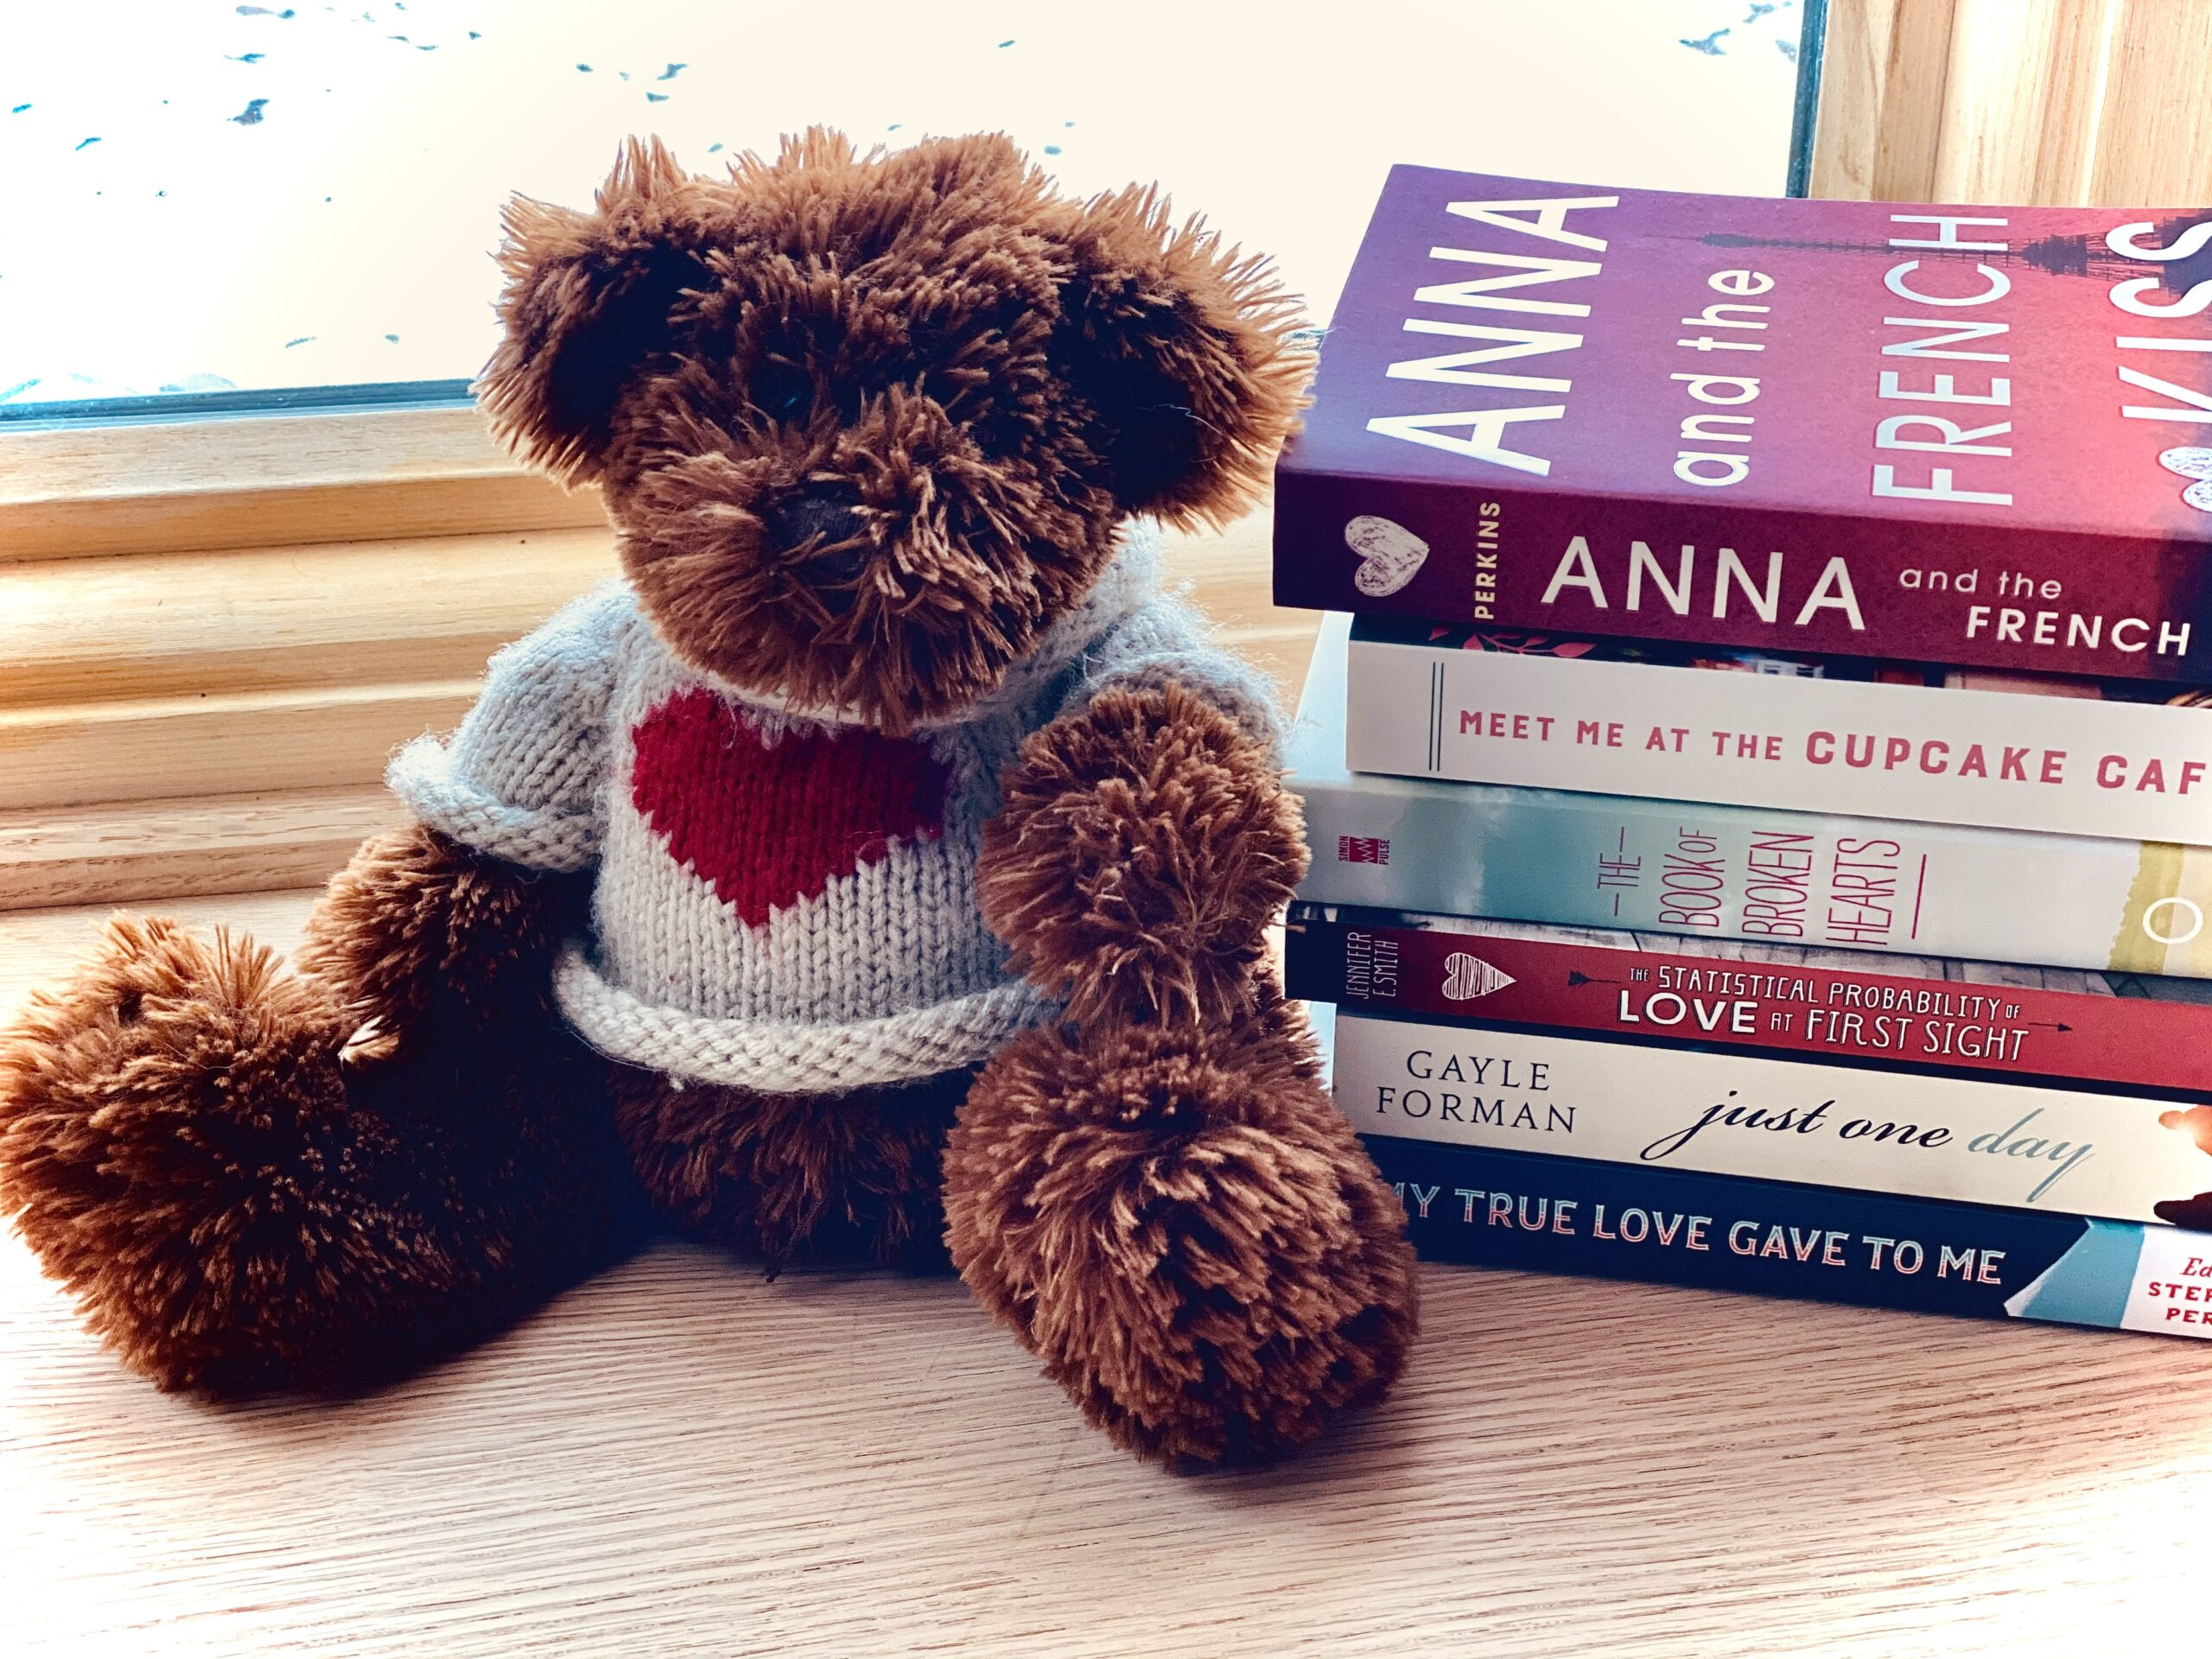 valentine, valentine's day 2021, love stories, love, romance, romance books, romance novels, writing, reading, popular genres, fiction,